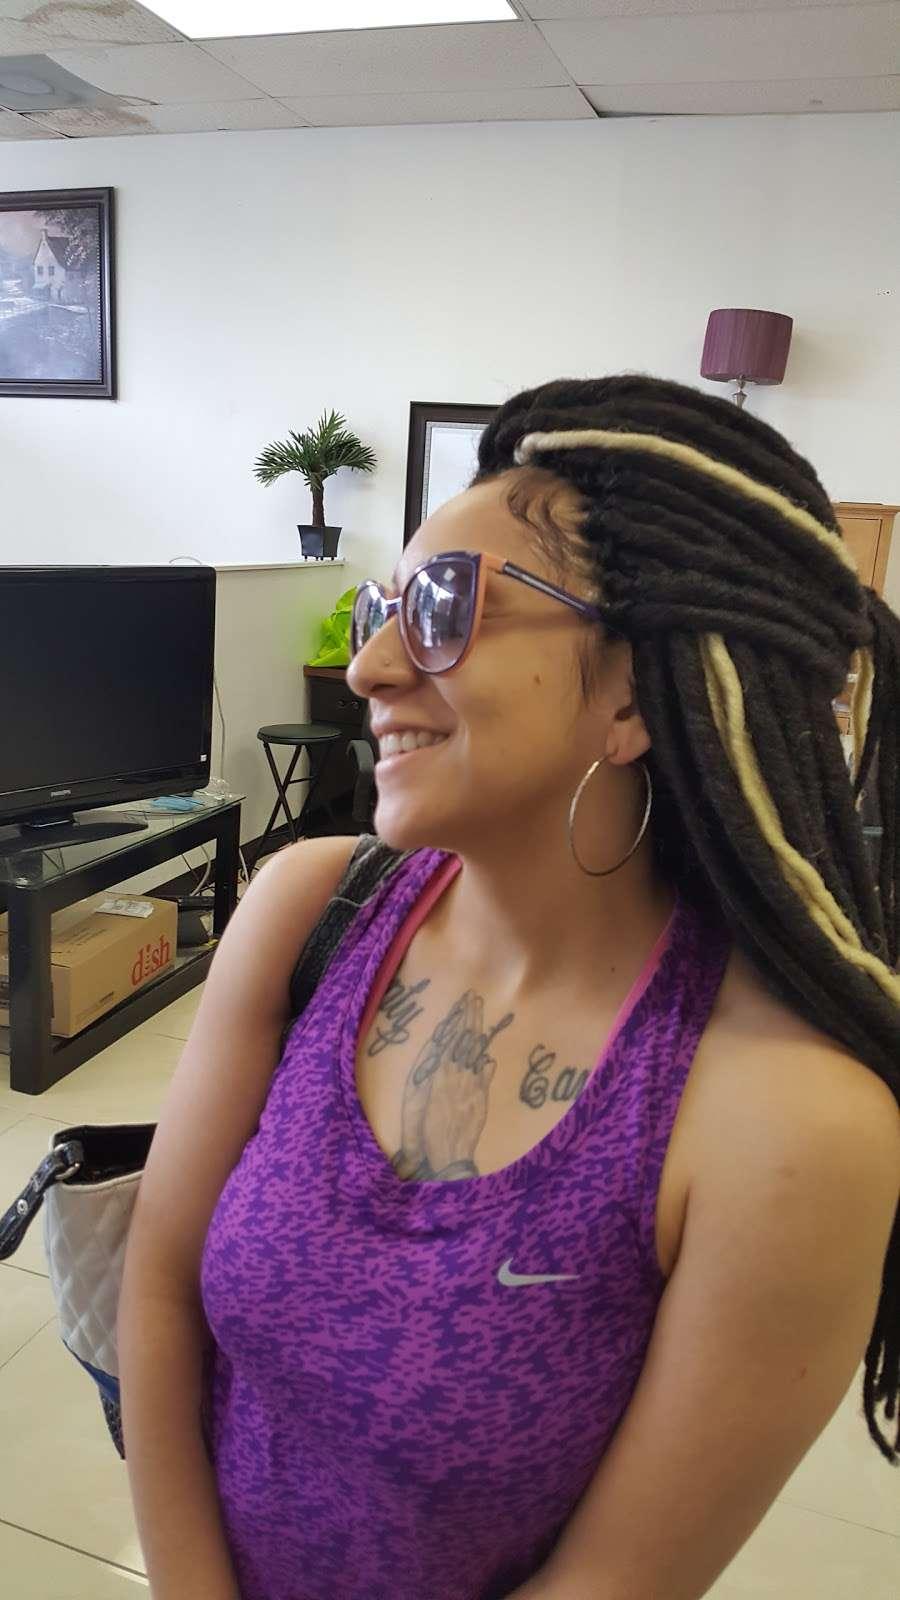 African Braids Center - hair care  | Photo 7 of 10 | Address: 309 W Kiest Blvd b, Dallas, TX 75224, USA | Phone: (855) 425-2977